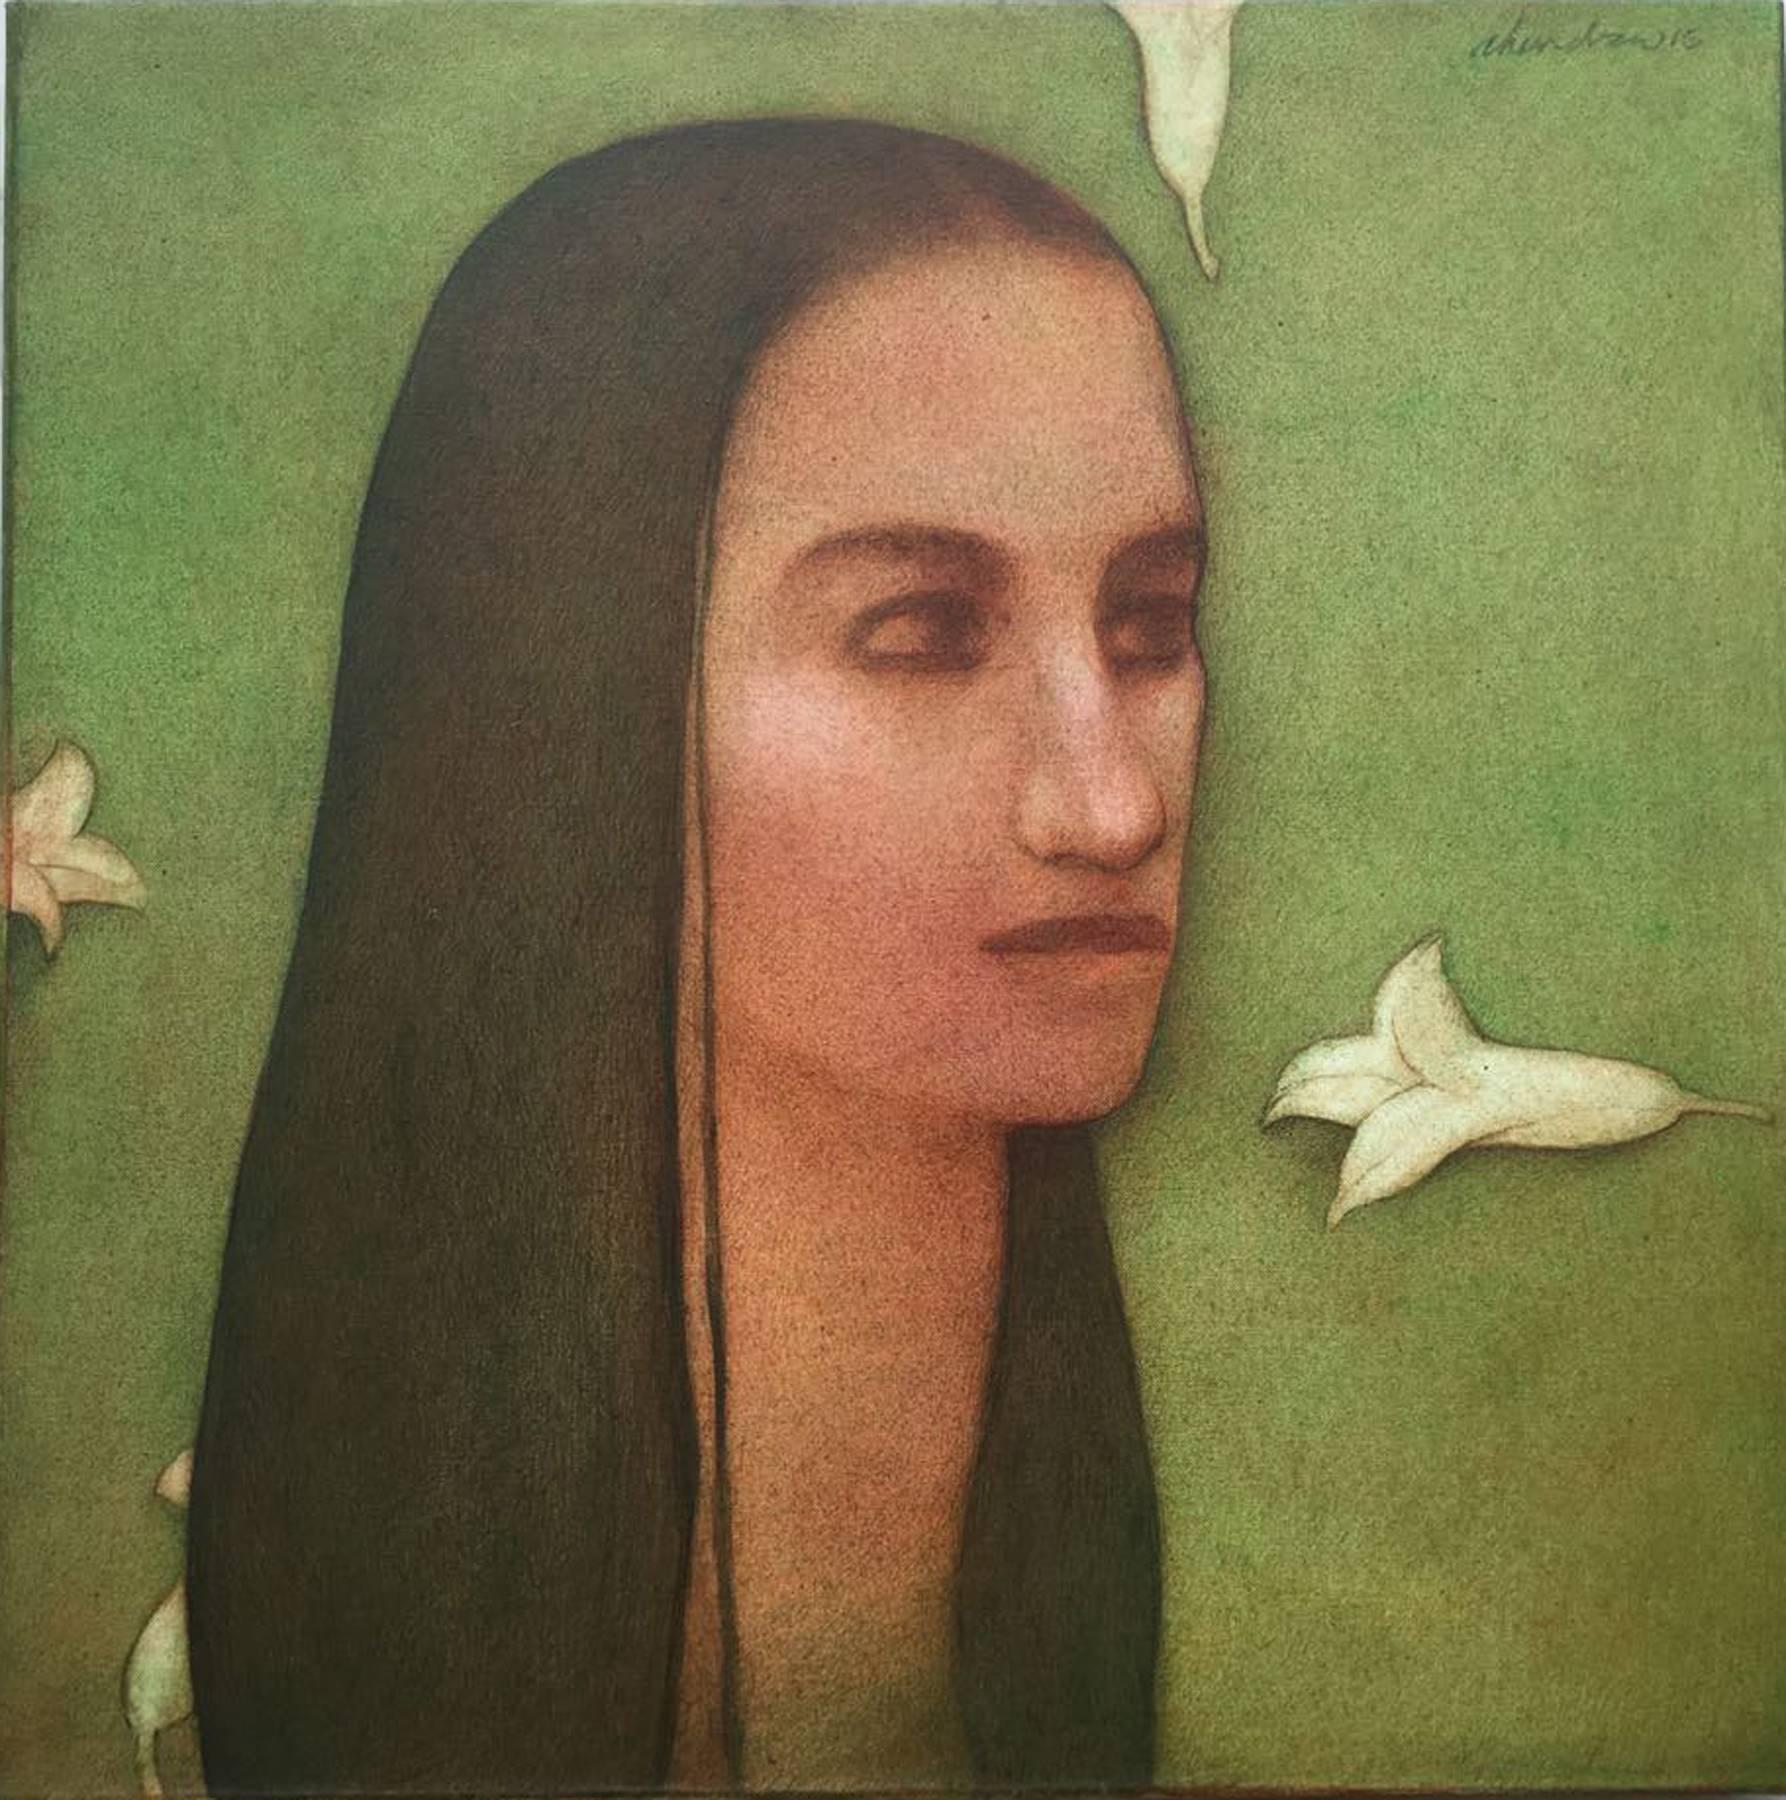 Figurative, woman with long hair, eyesight, acrylic in green, black by Chandra